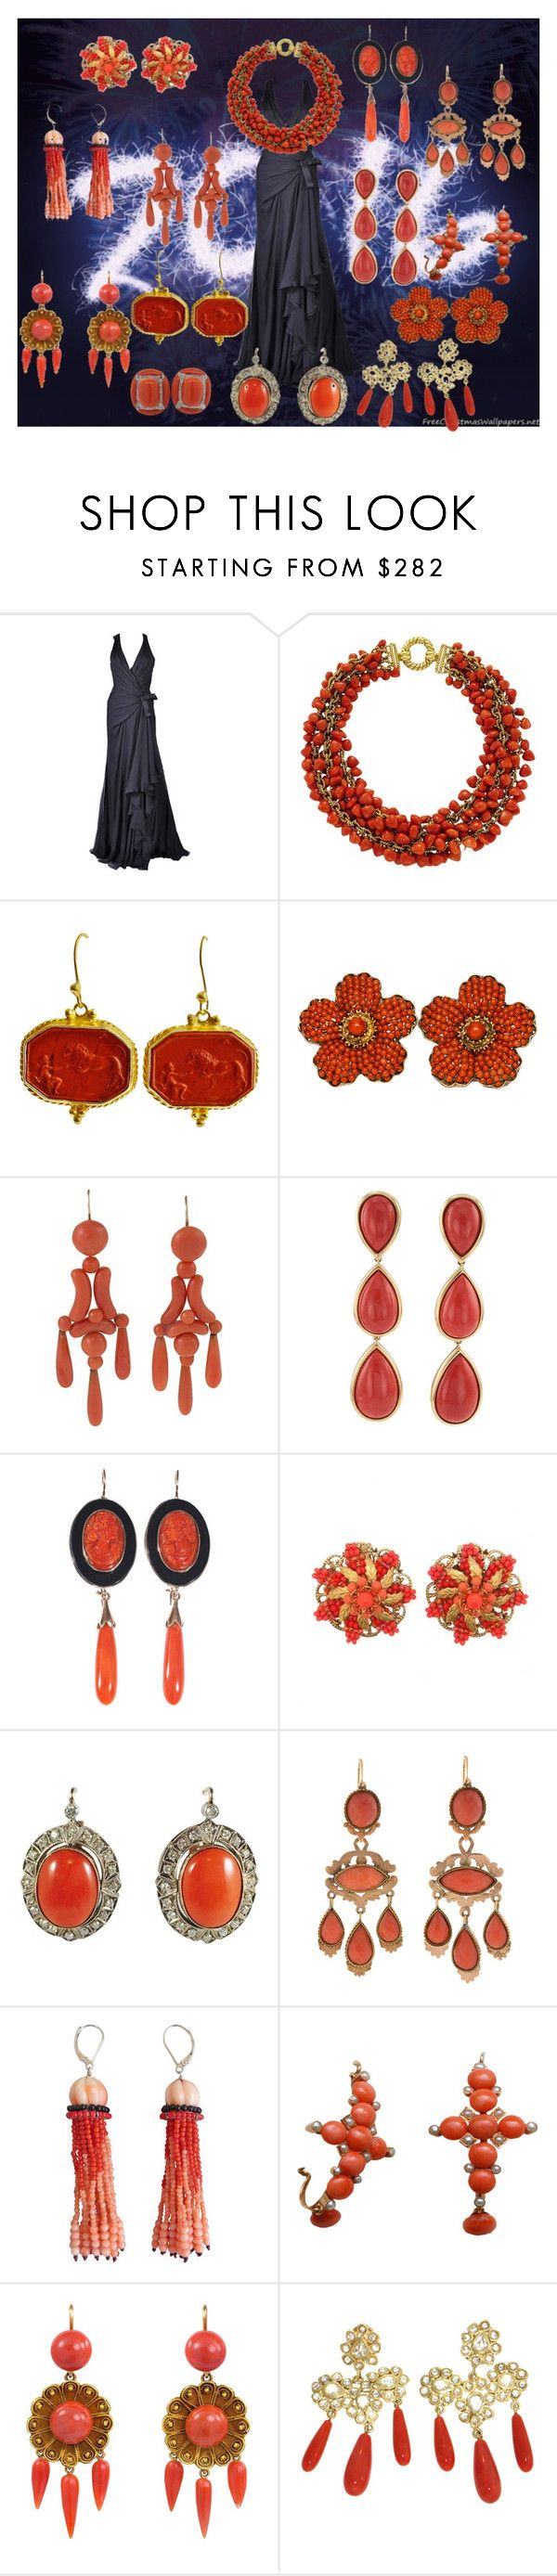 """Il corallo porta fortuna !!!"" by mariapiaflaccomio ❤ liked on Polyvore featuring Versace, Tiffany & Co., Tagliamonte, Marina J., LFrank, women's clothing, women's fashion, women, female and woman"